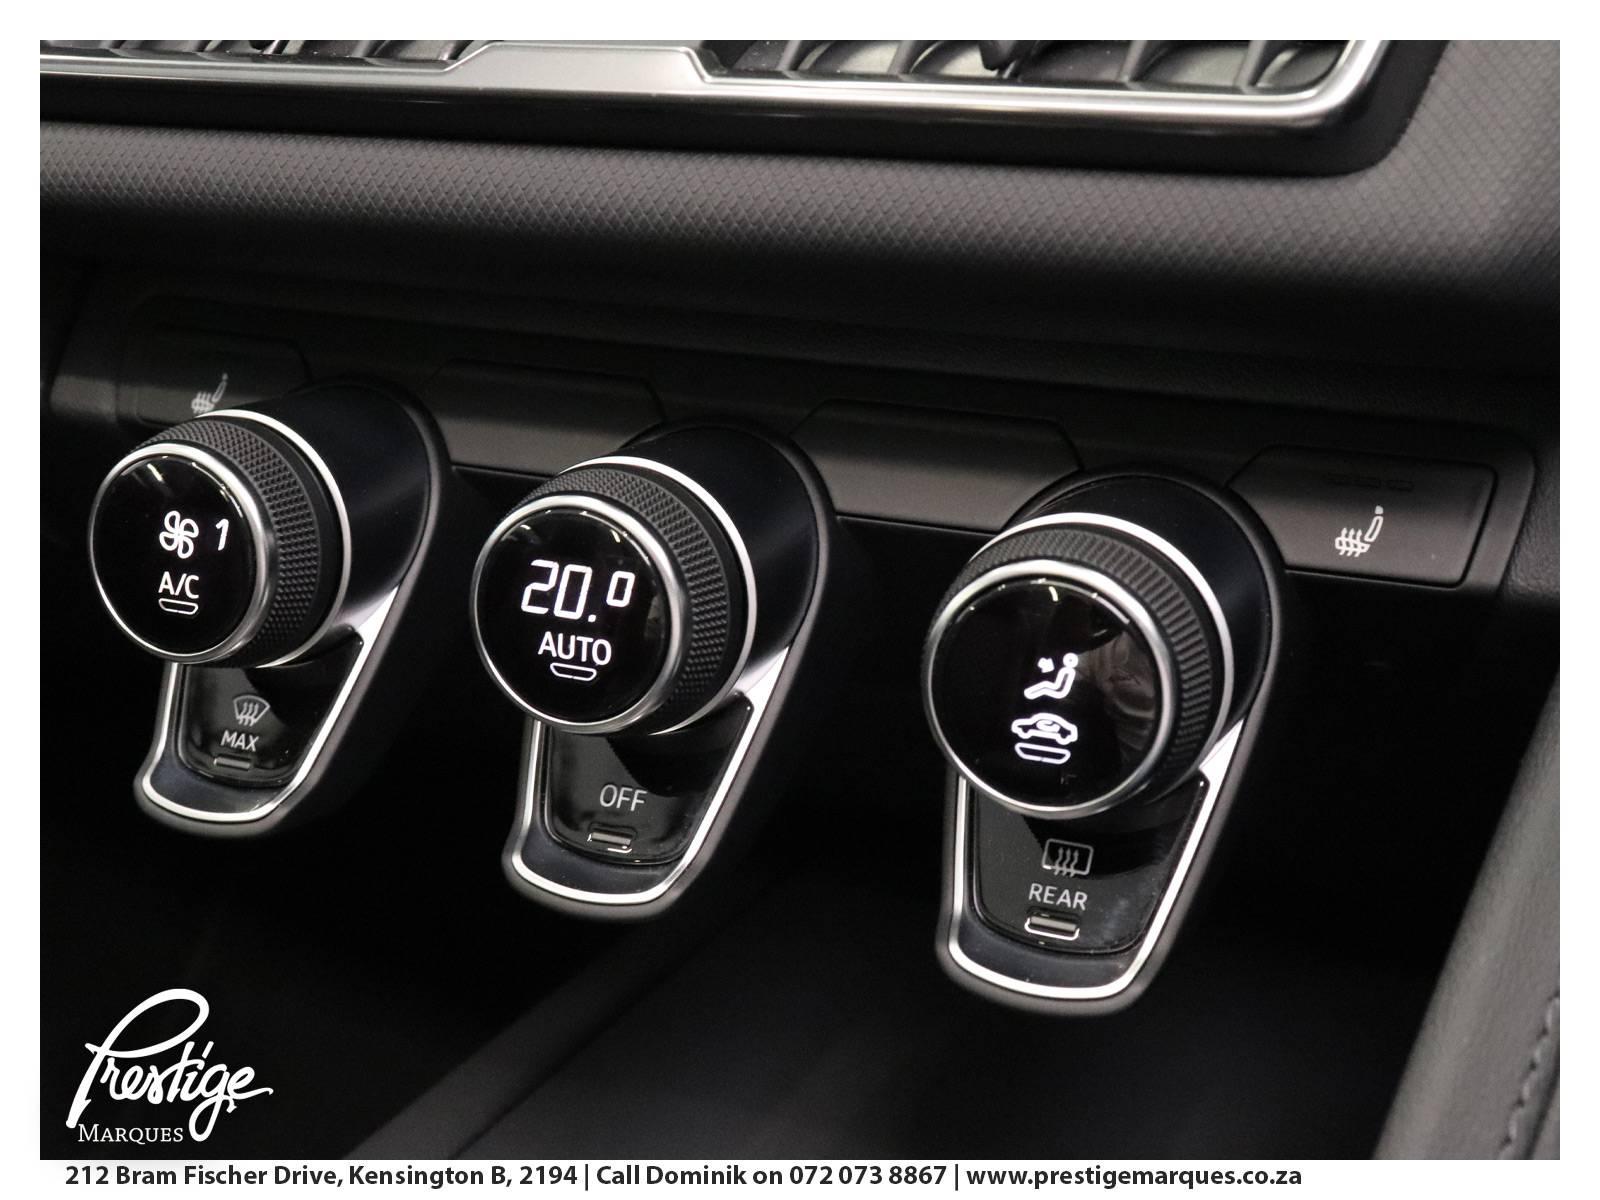 2019-Audi-R8-Prestige-Marques-Randburg-Sandton-23